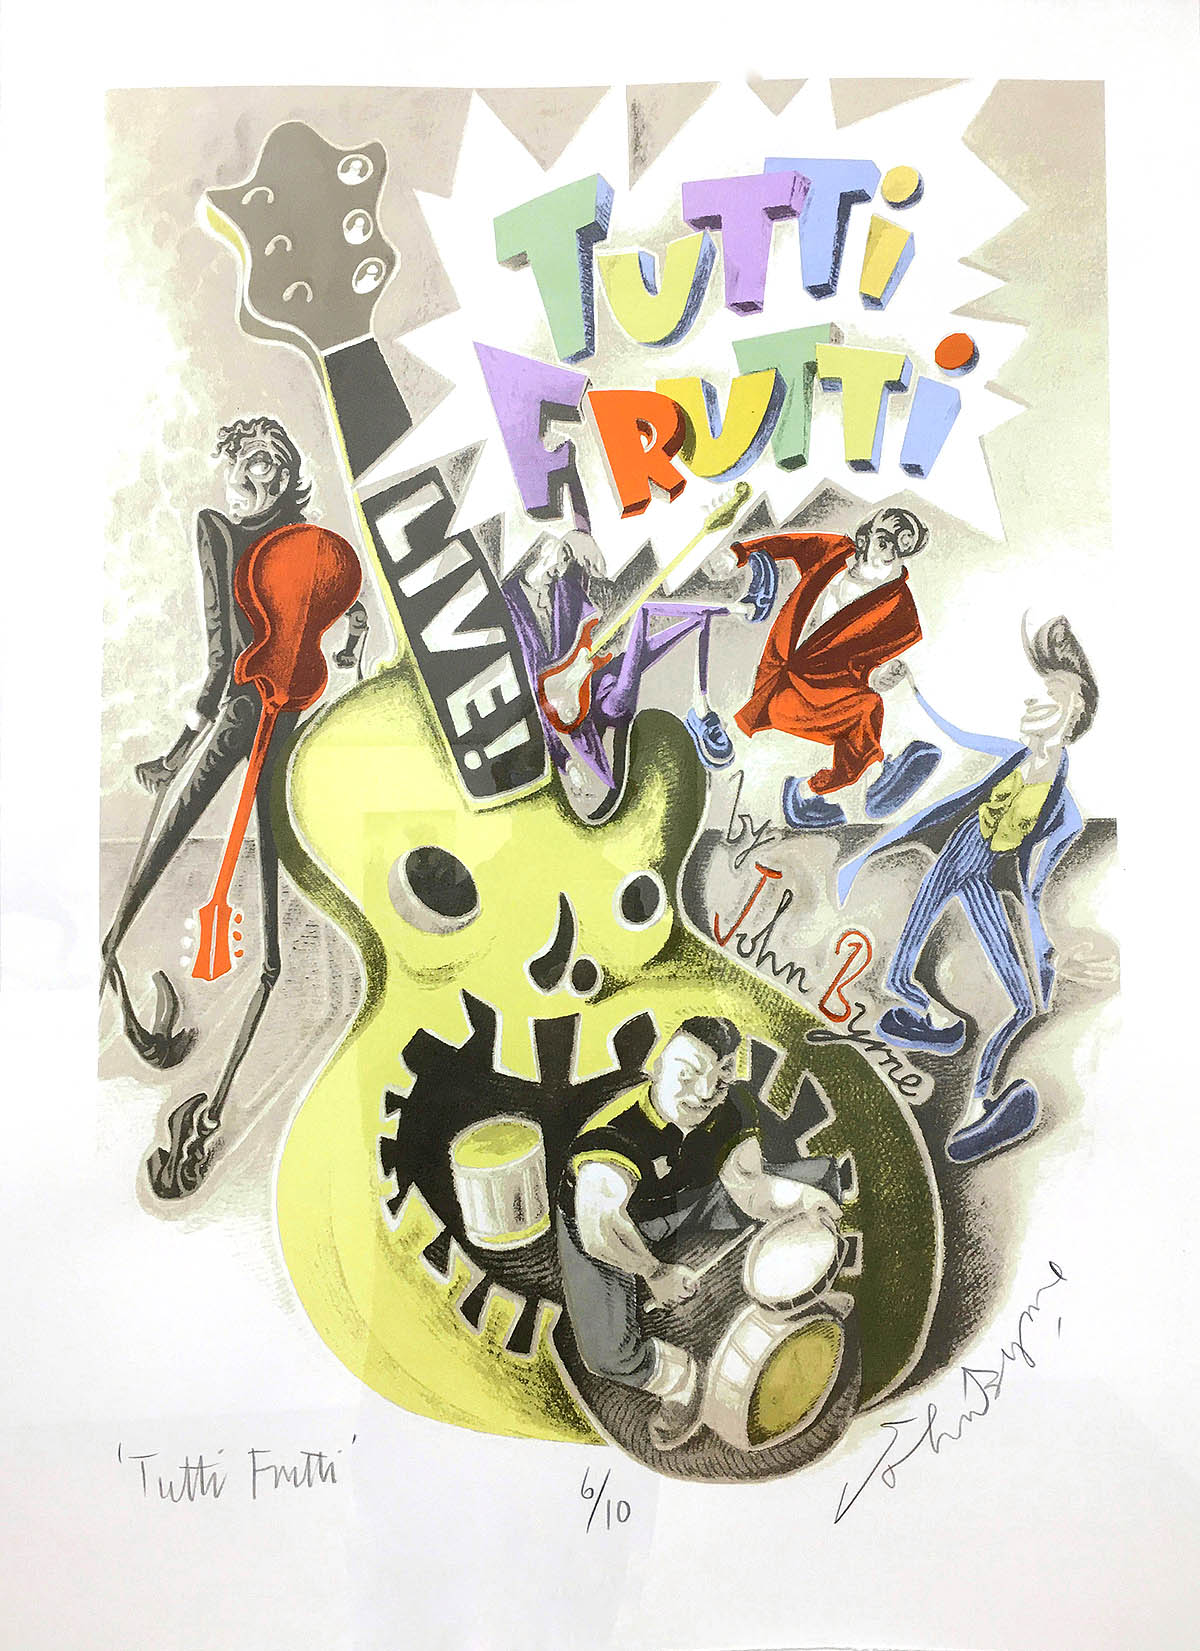 John Byrne, 'Tutti Frutti', screenprint with mixed media.jpg